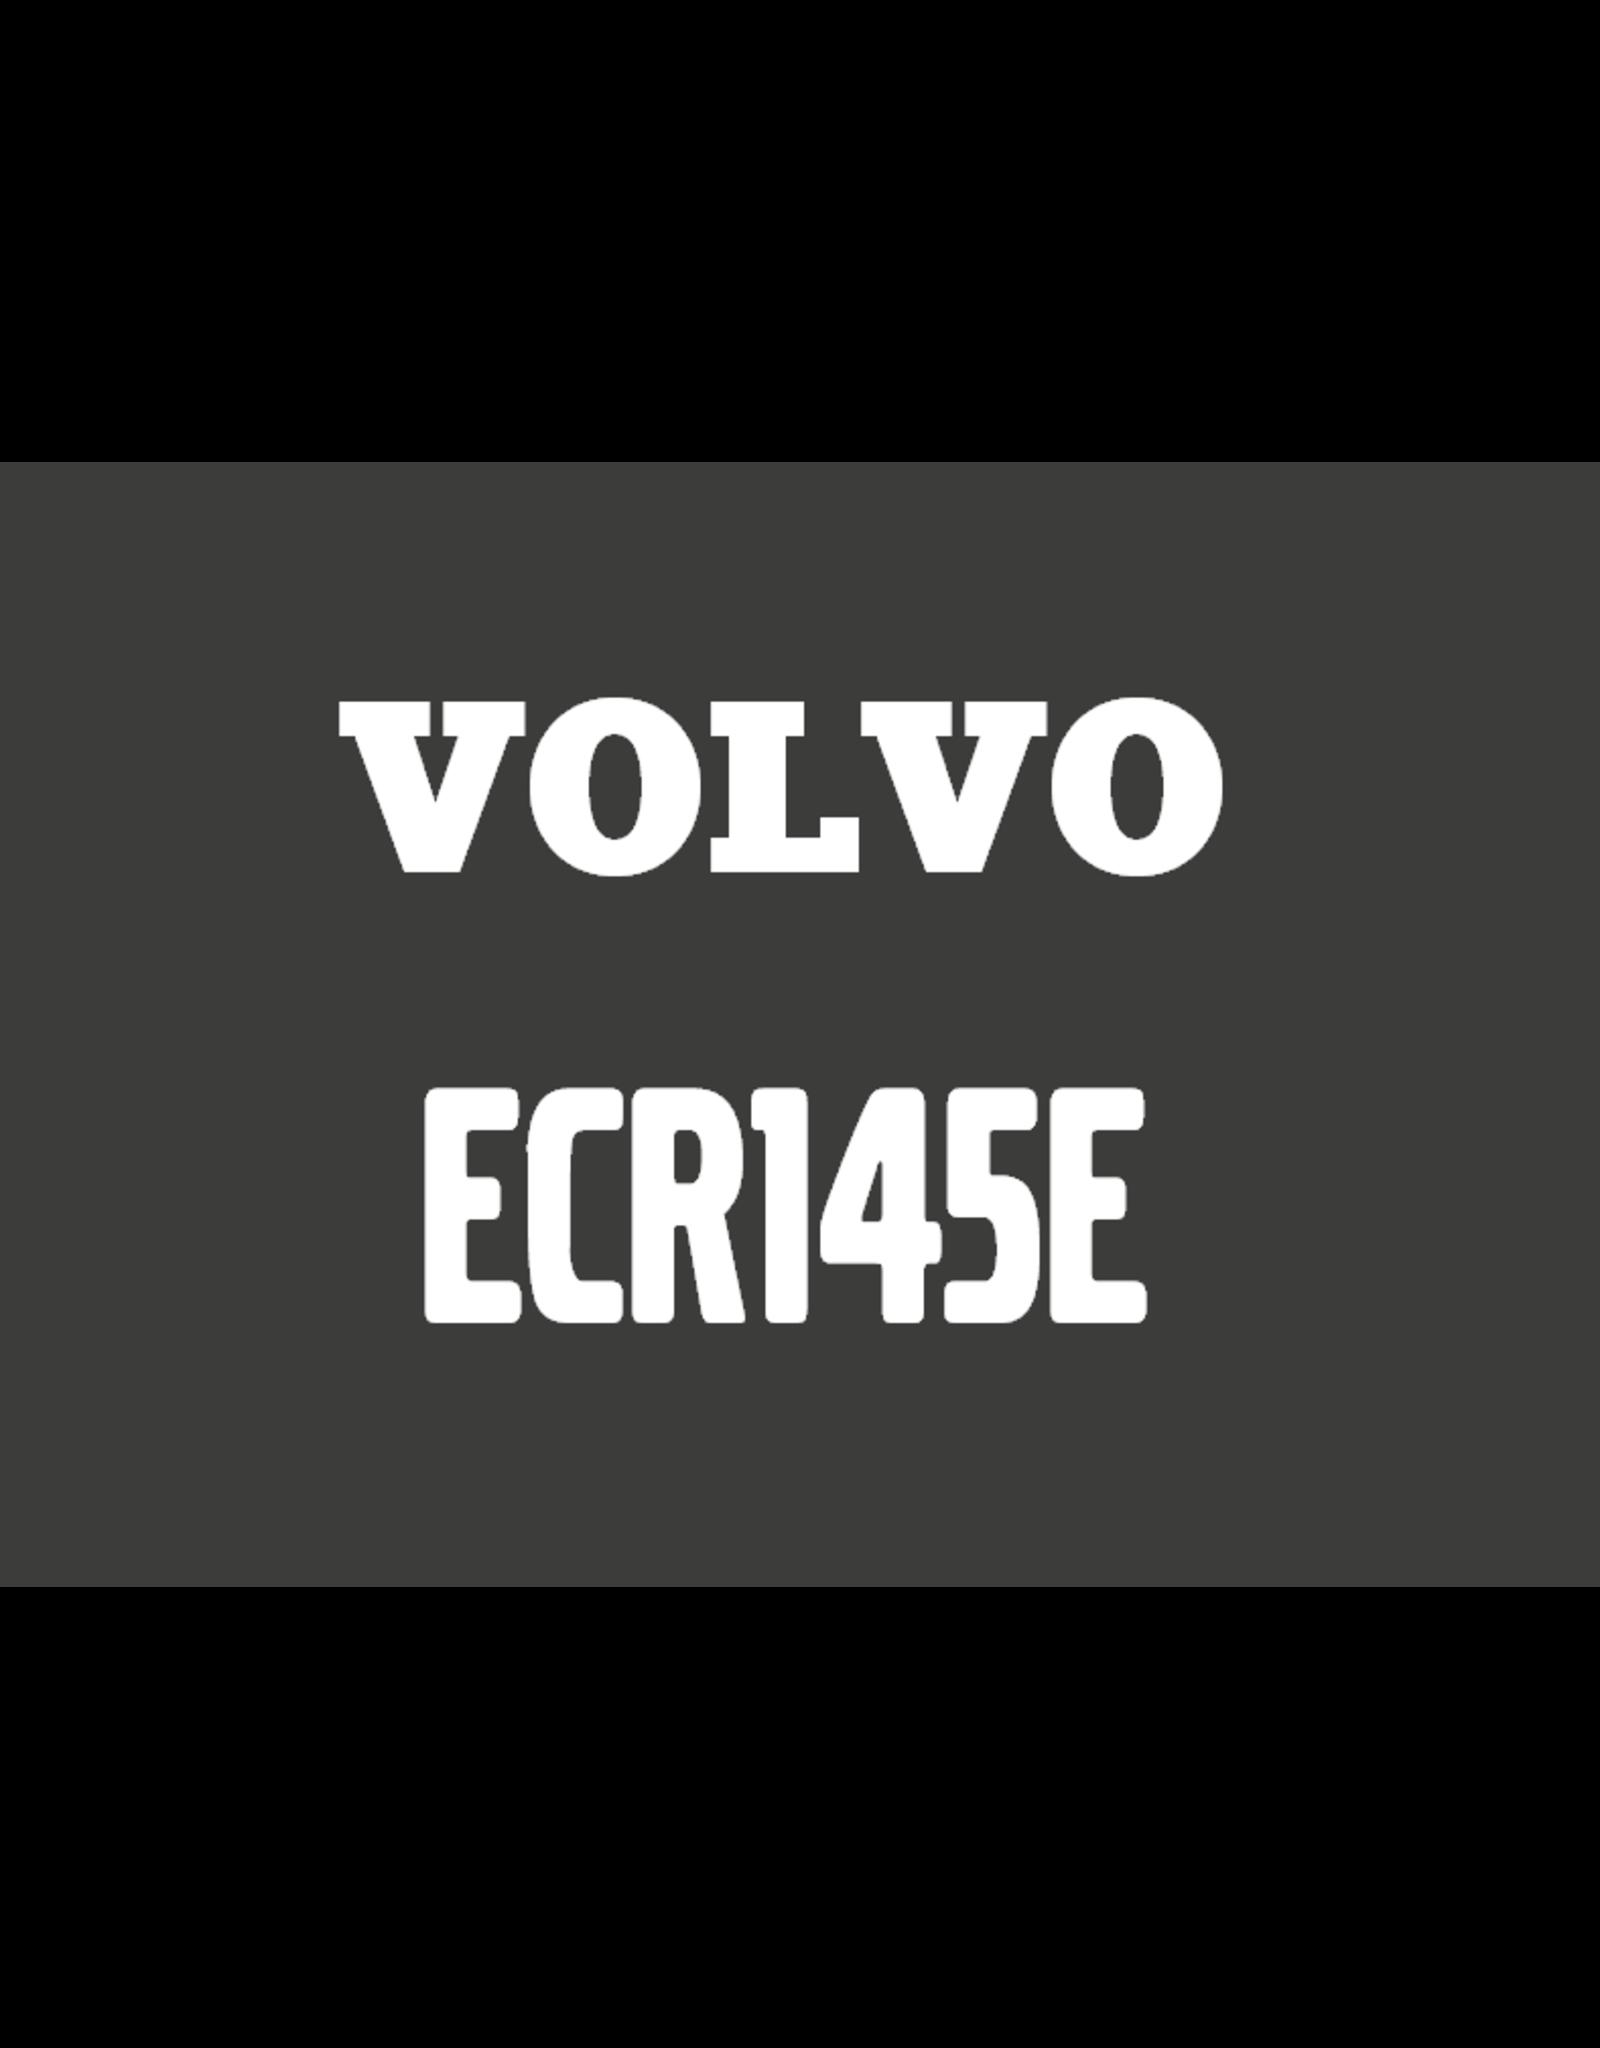 Echle Hartstahl GmbH FOPS für Volvo ECR145E